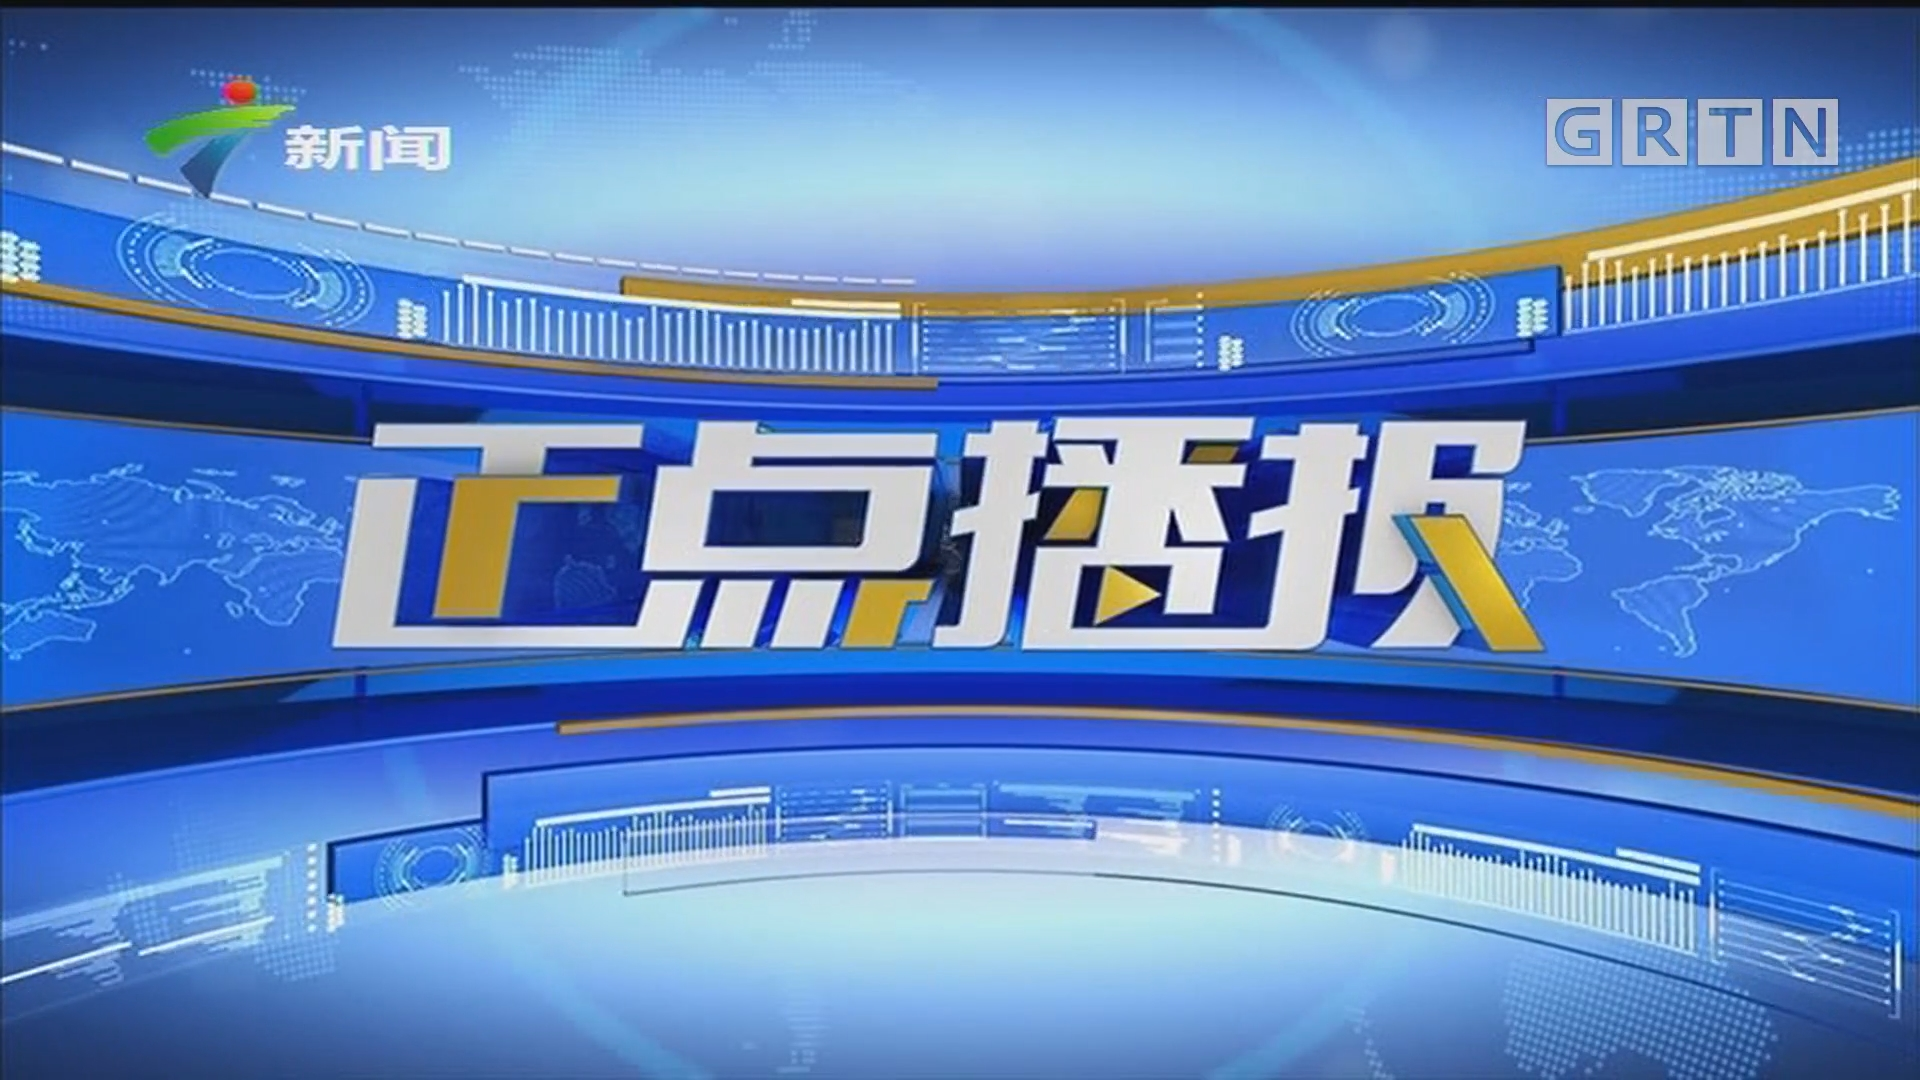 [HD][2019-11-12]正点播报:第二十一届高交会明天开幕 广东展团科技亮点纷呈